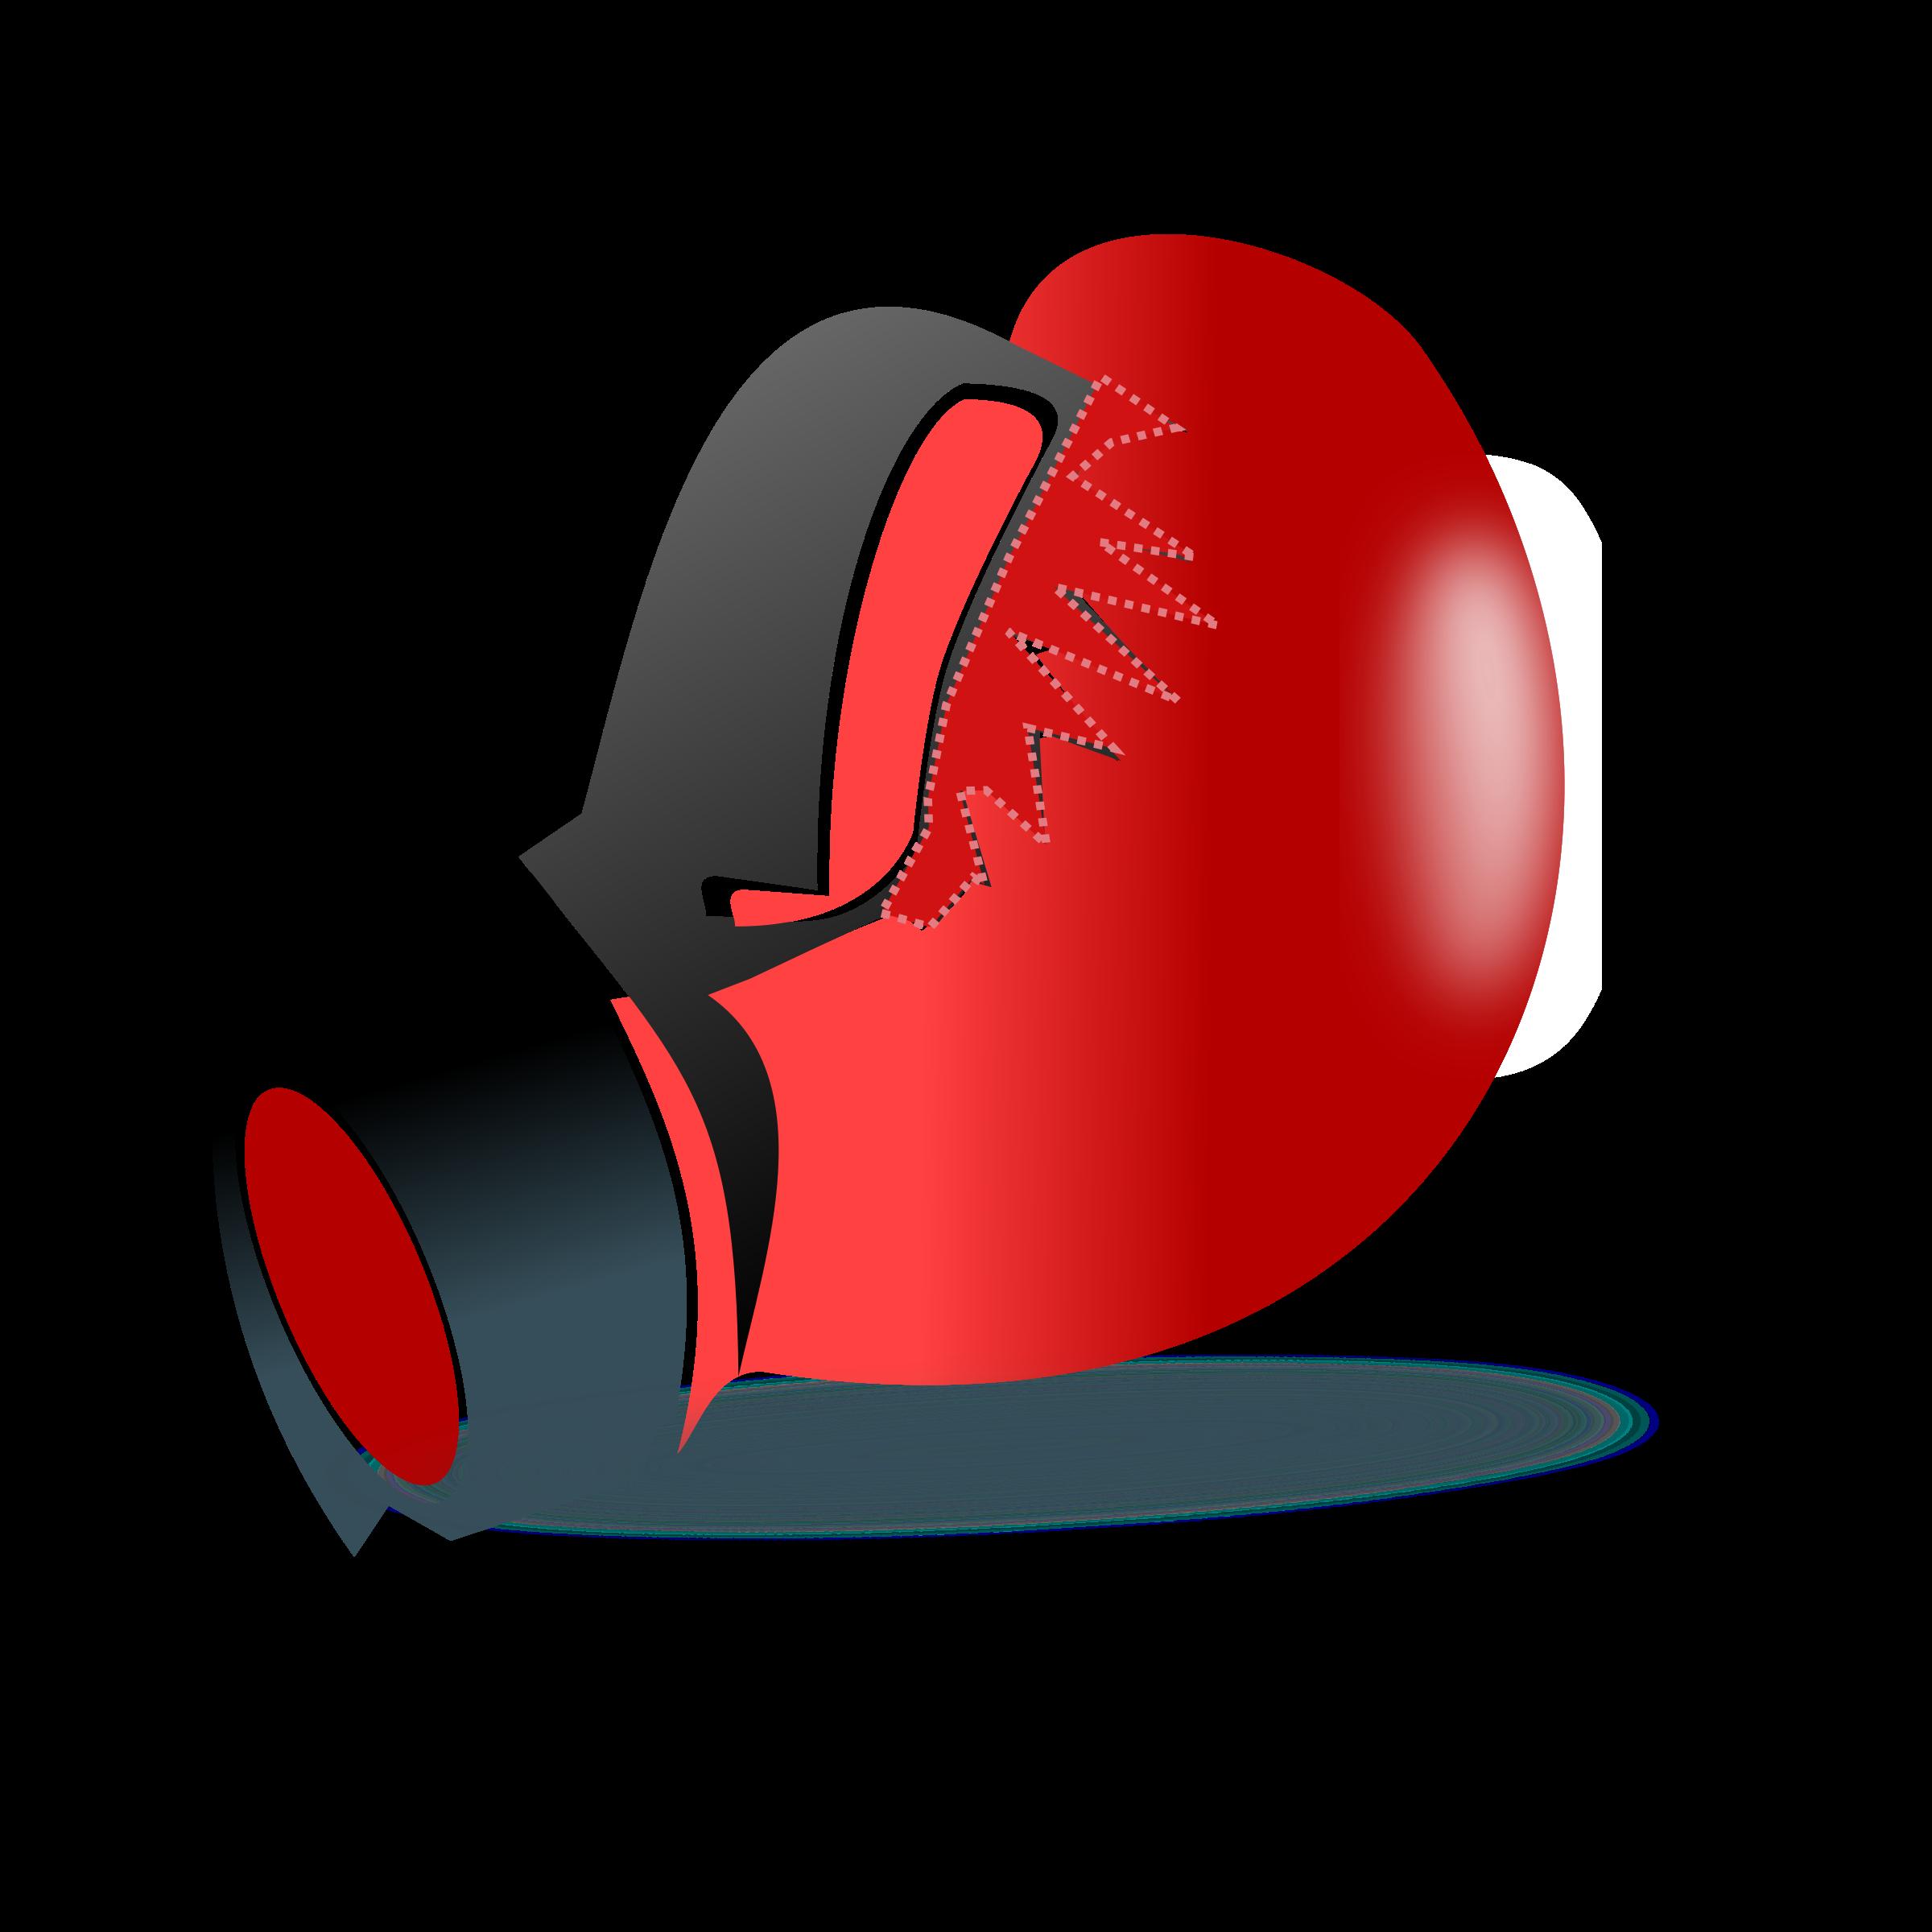 Gloves png transparent images. Helmet clipart boxing